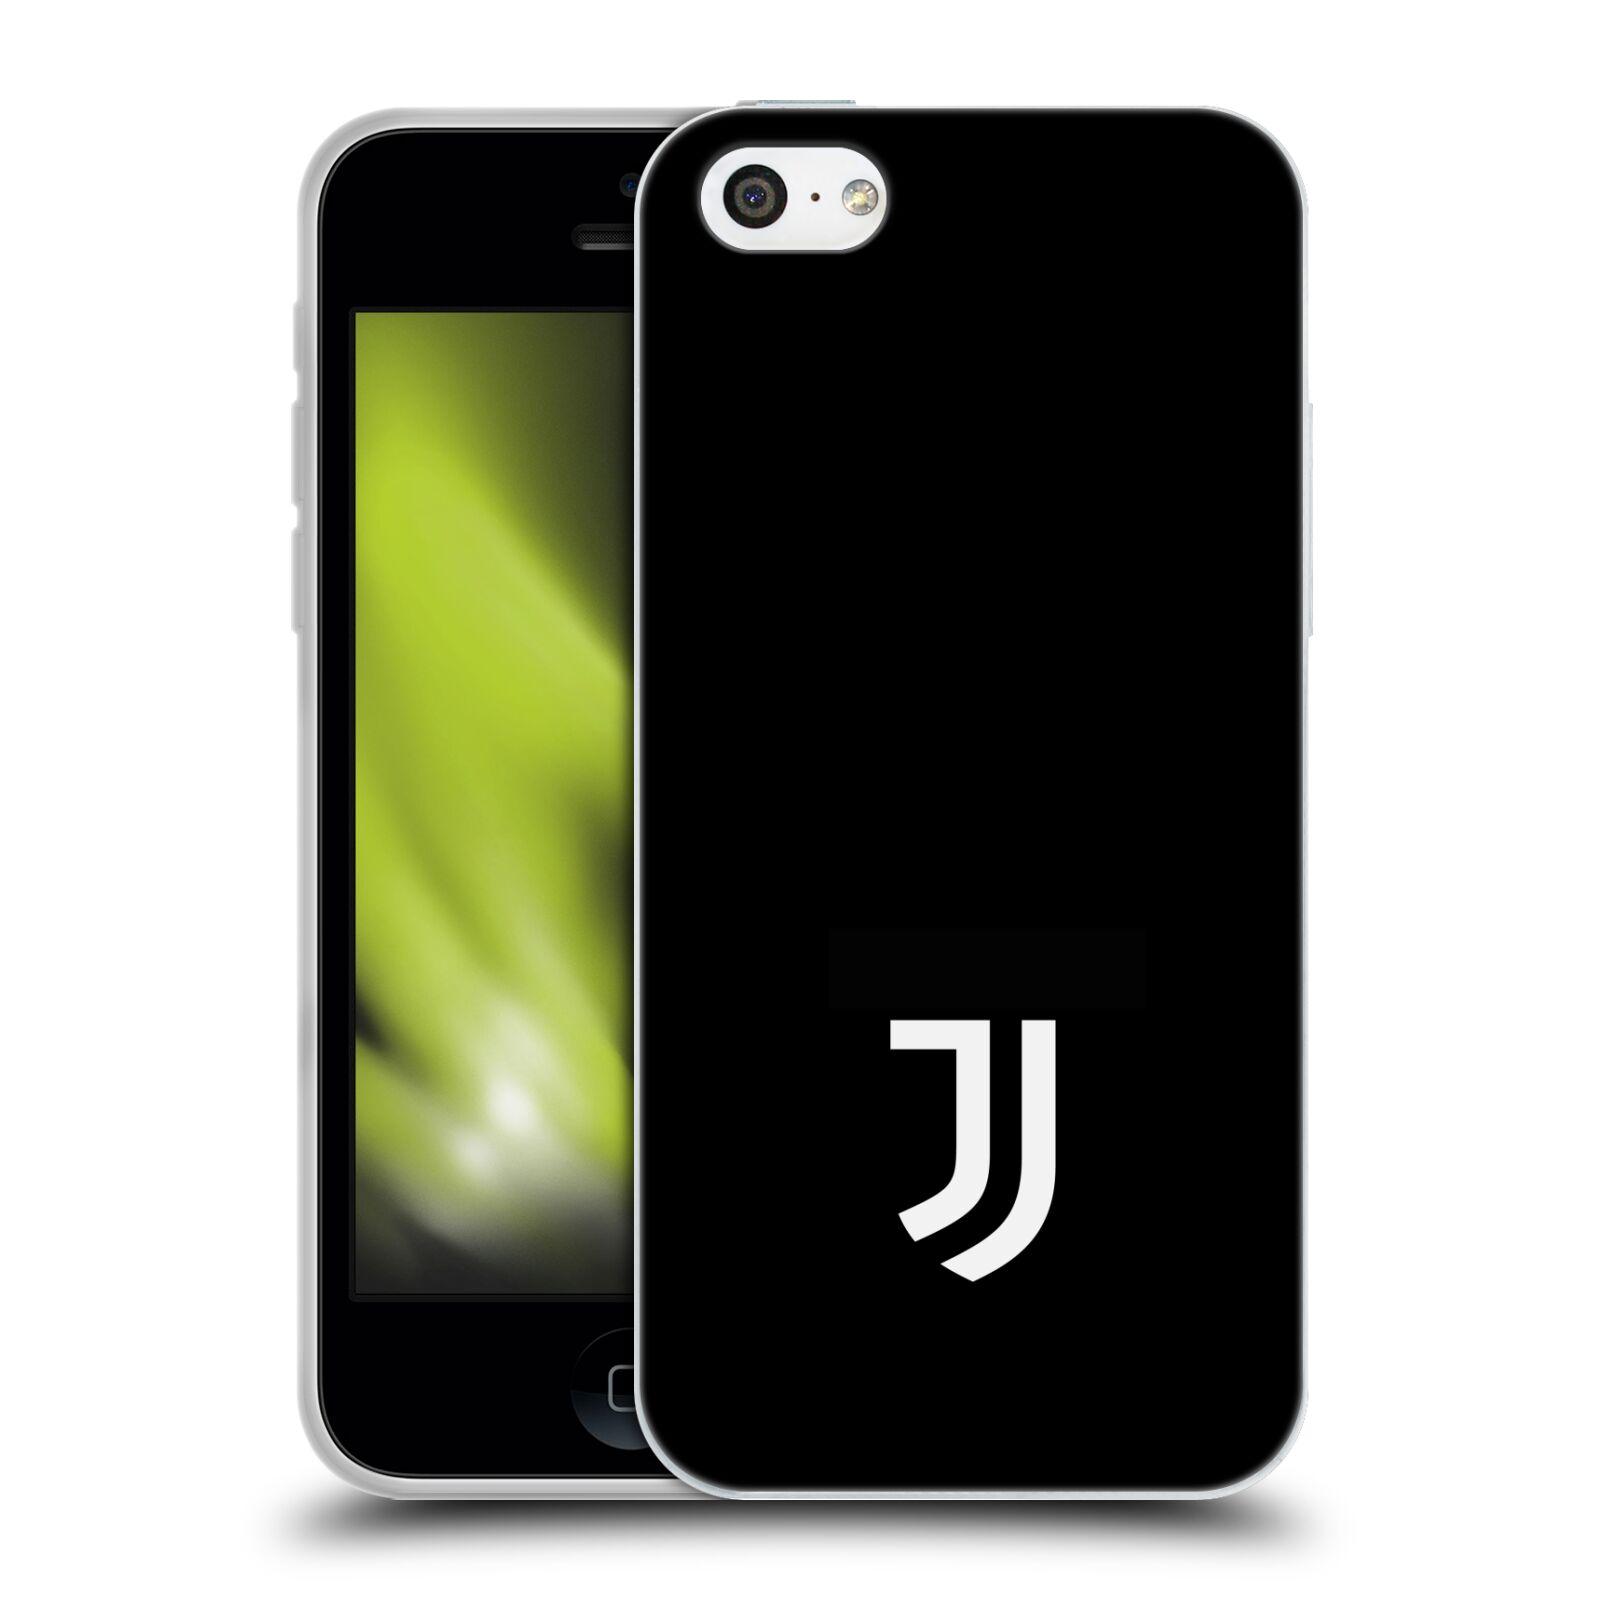 HEAD CASE silikonový obal na mobil Apple Iphone 5C Fotbalový klub Juventus  FC černé pozadí bílý znak malý cf5b76d41c5